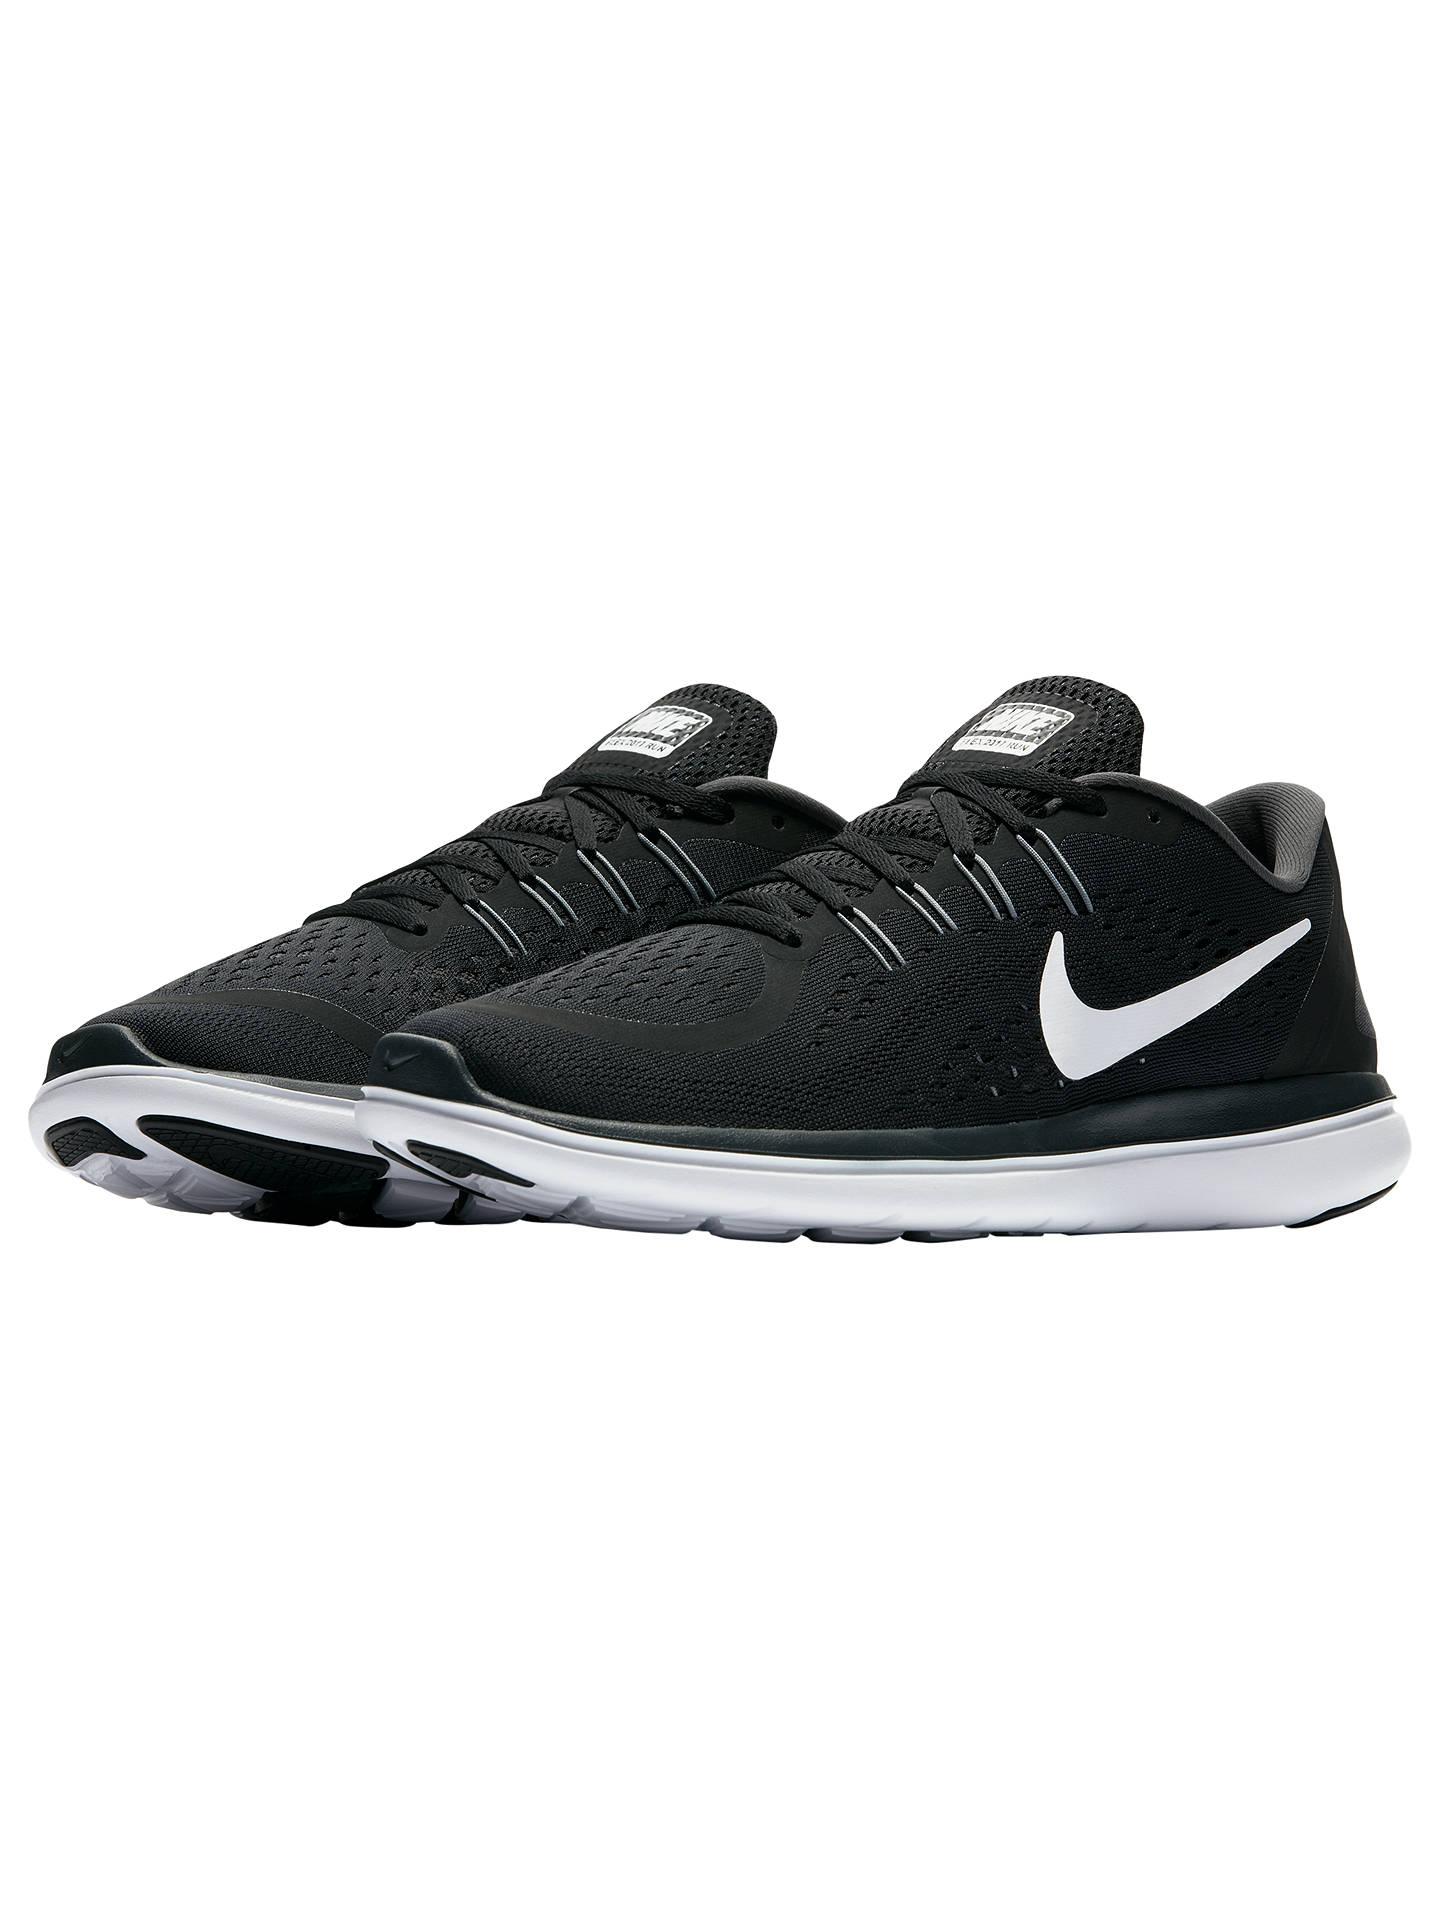 contar sofá acoplador  Nike Flex 2017 RN Men's Running Shoes at John Lewis & Partners